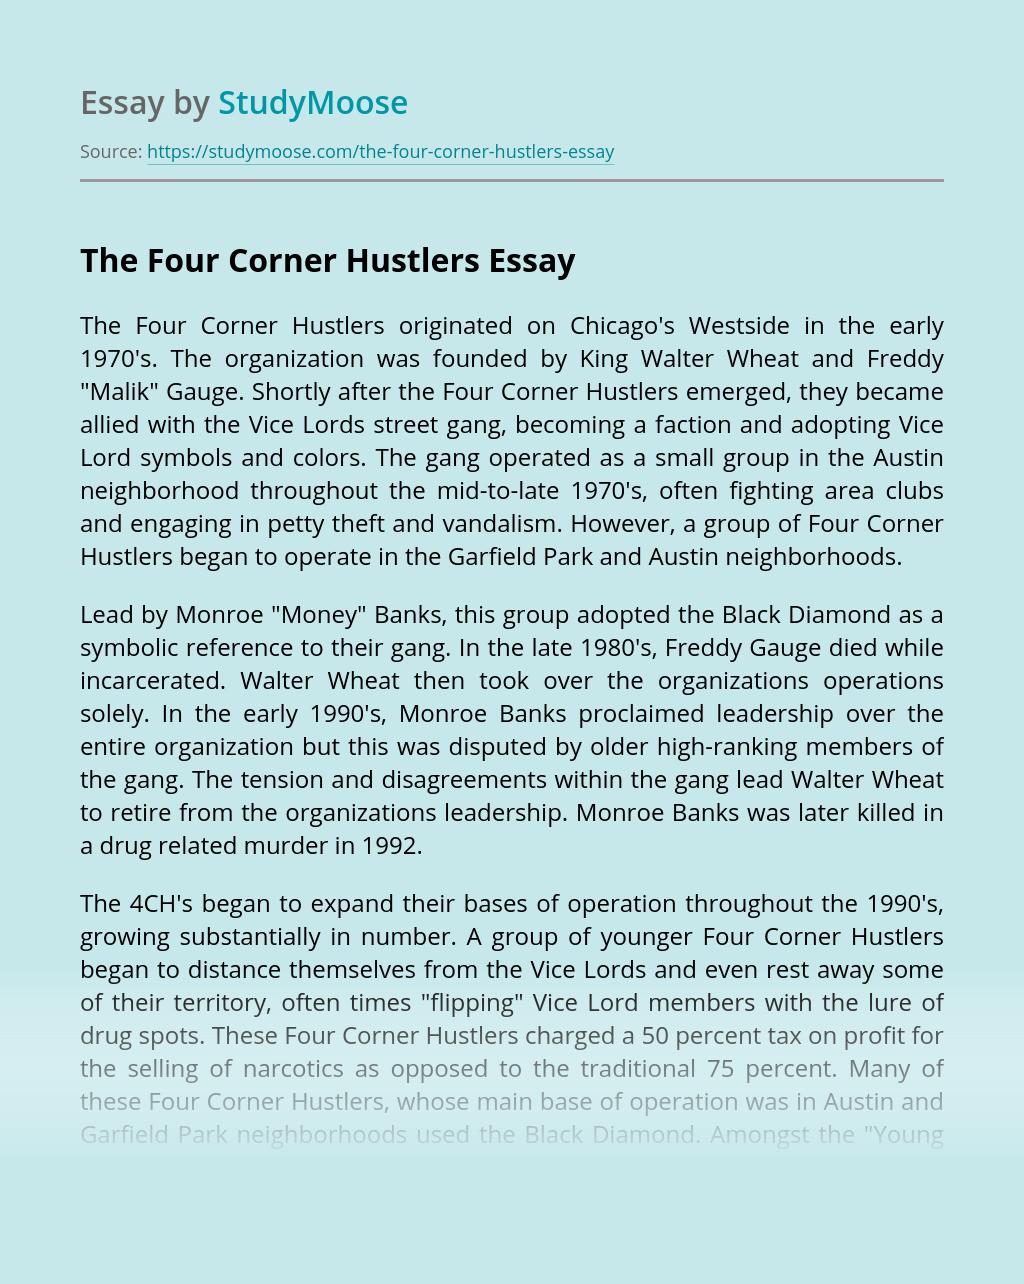 The Four Corner Hustlers